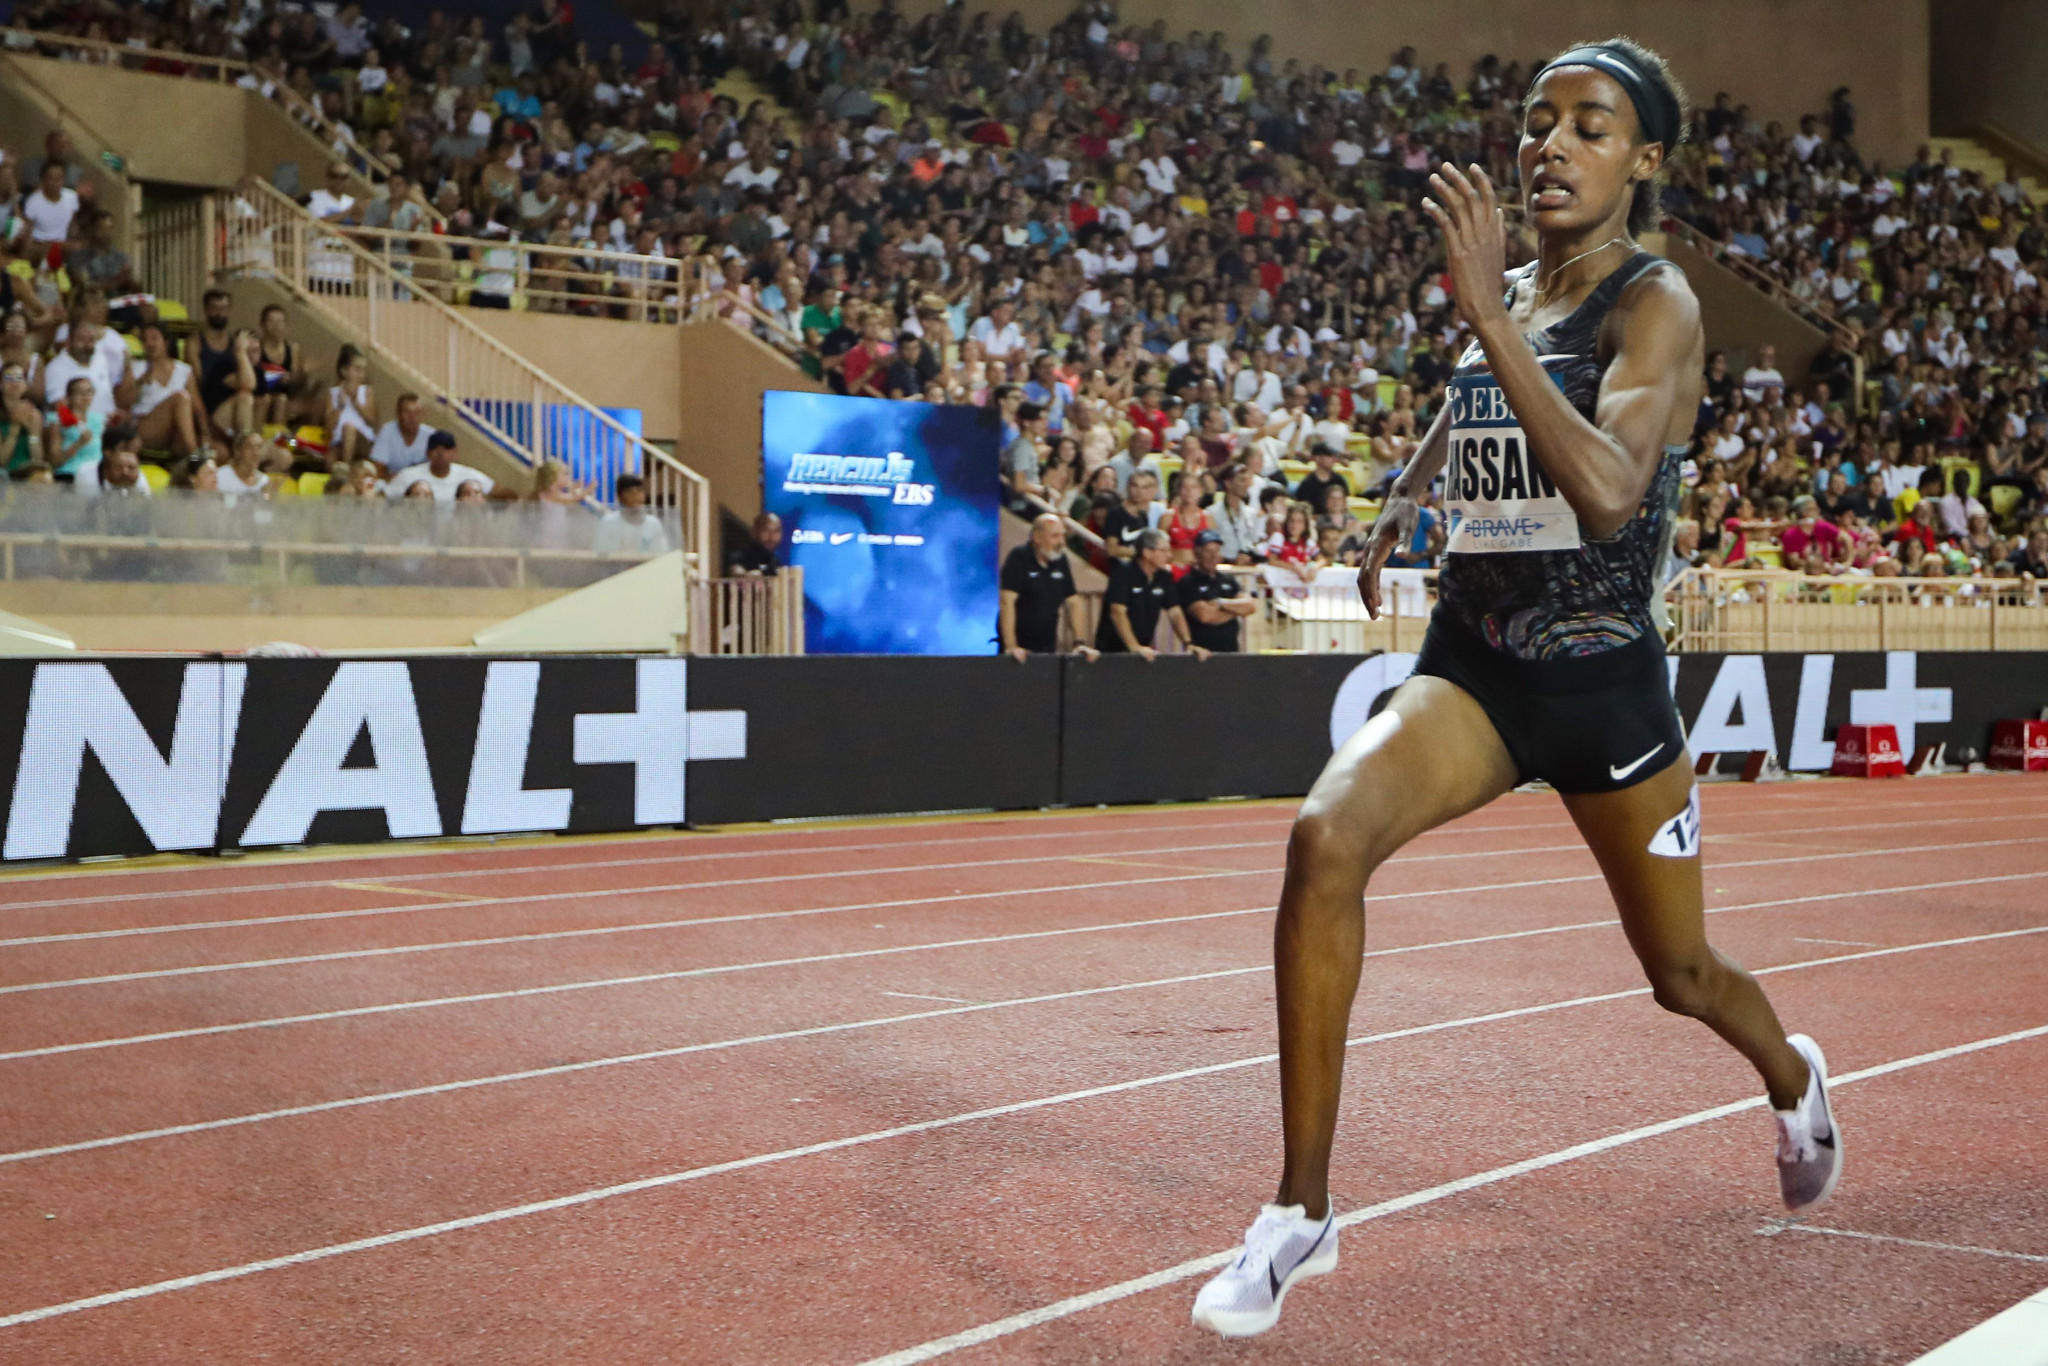 Hassan breaks women's mile world record at Monaco Diamond League meeting